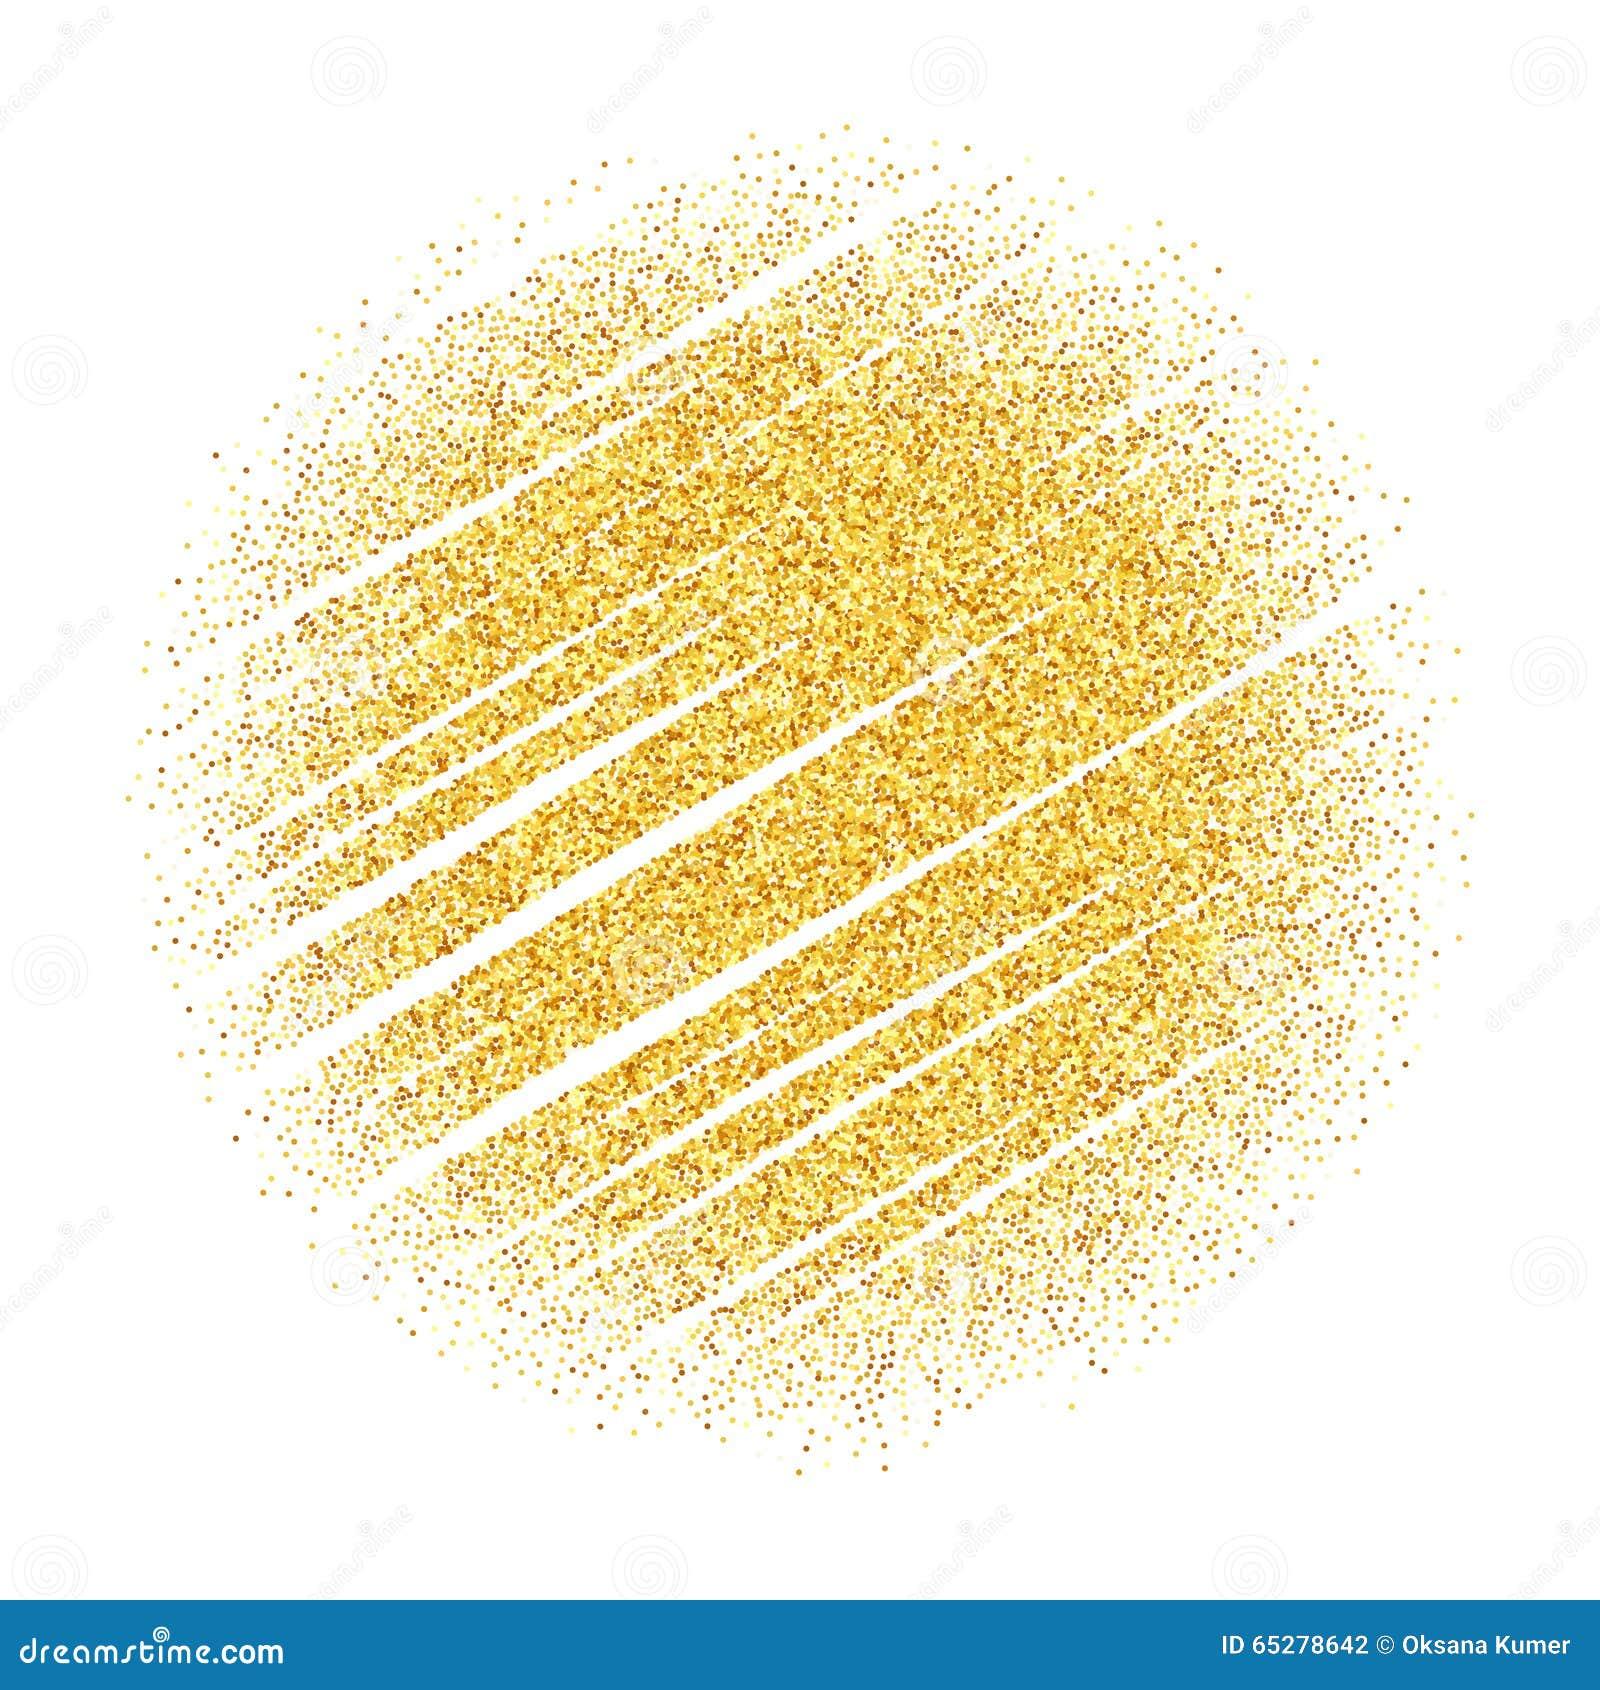 abstract vector gold dust glitter star wave stock vector illustration of glitter christmas. Black Bedroom Furniture Sets. Home Design Ideas